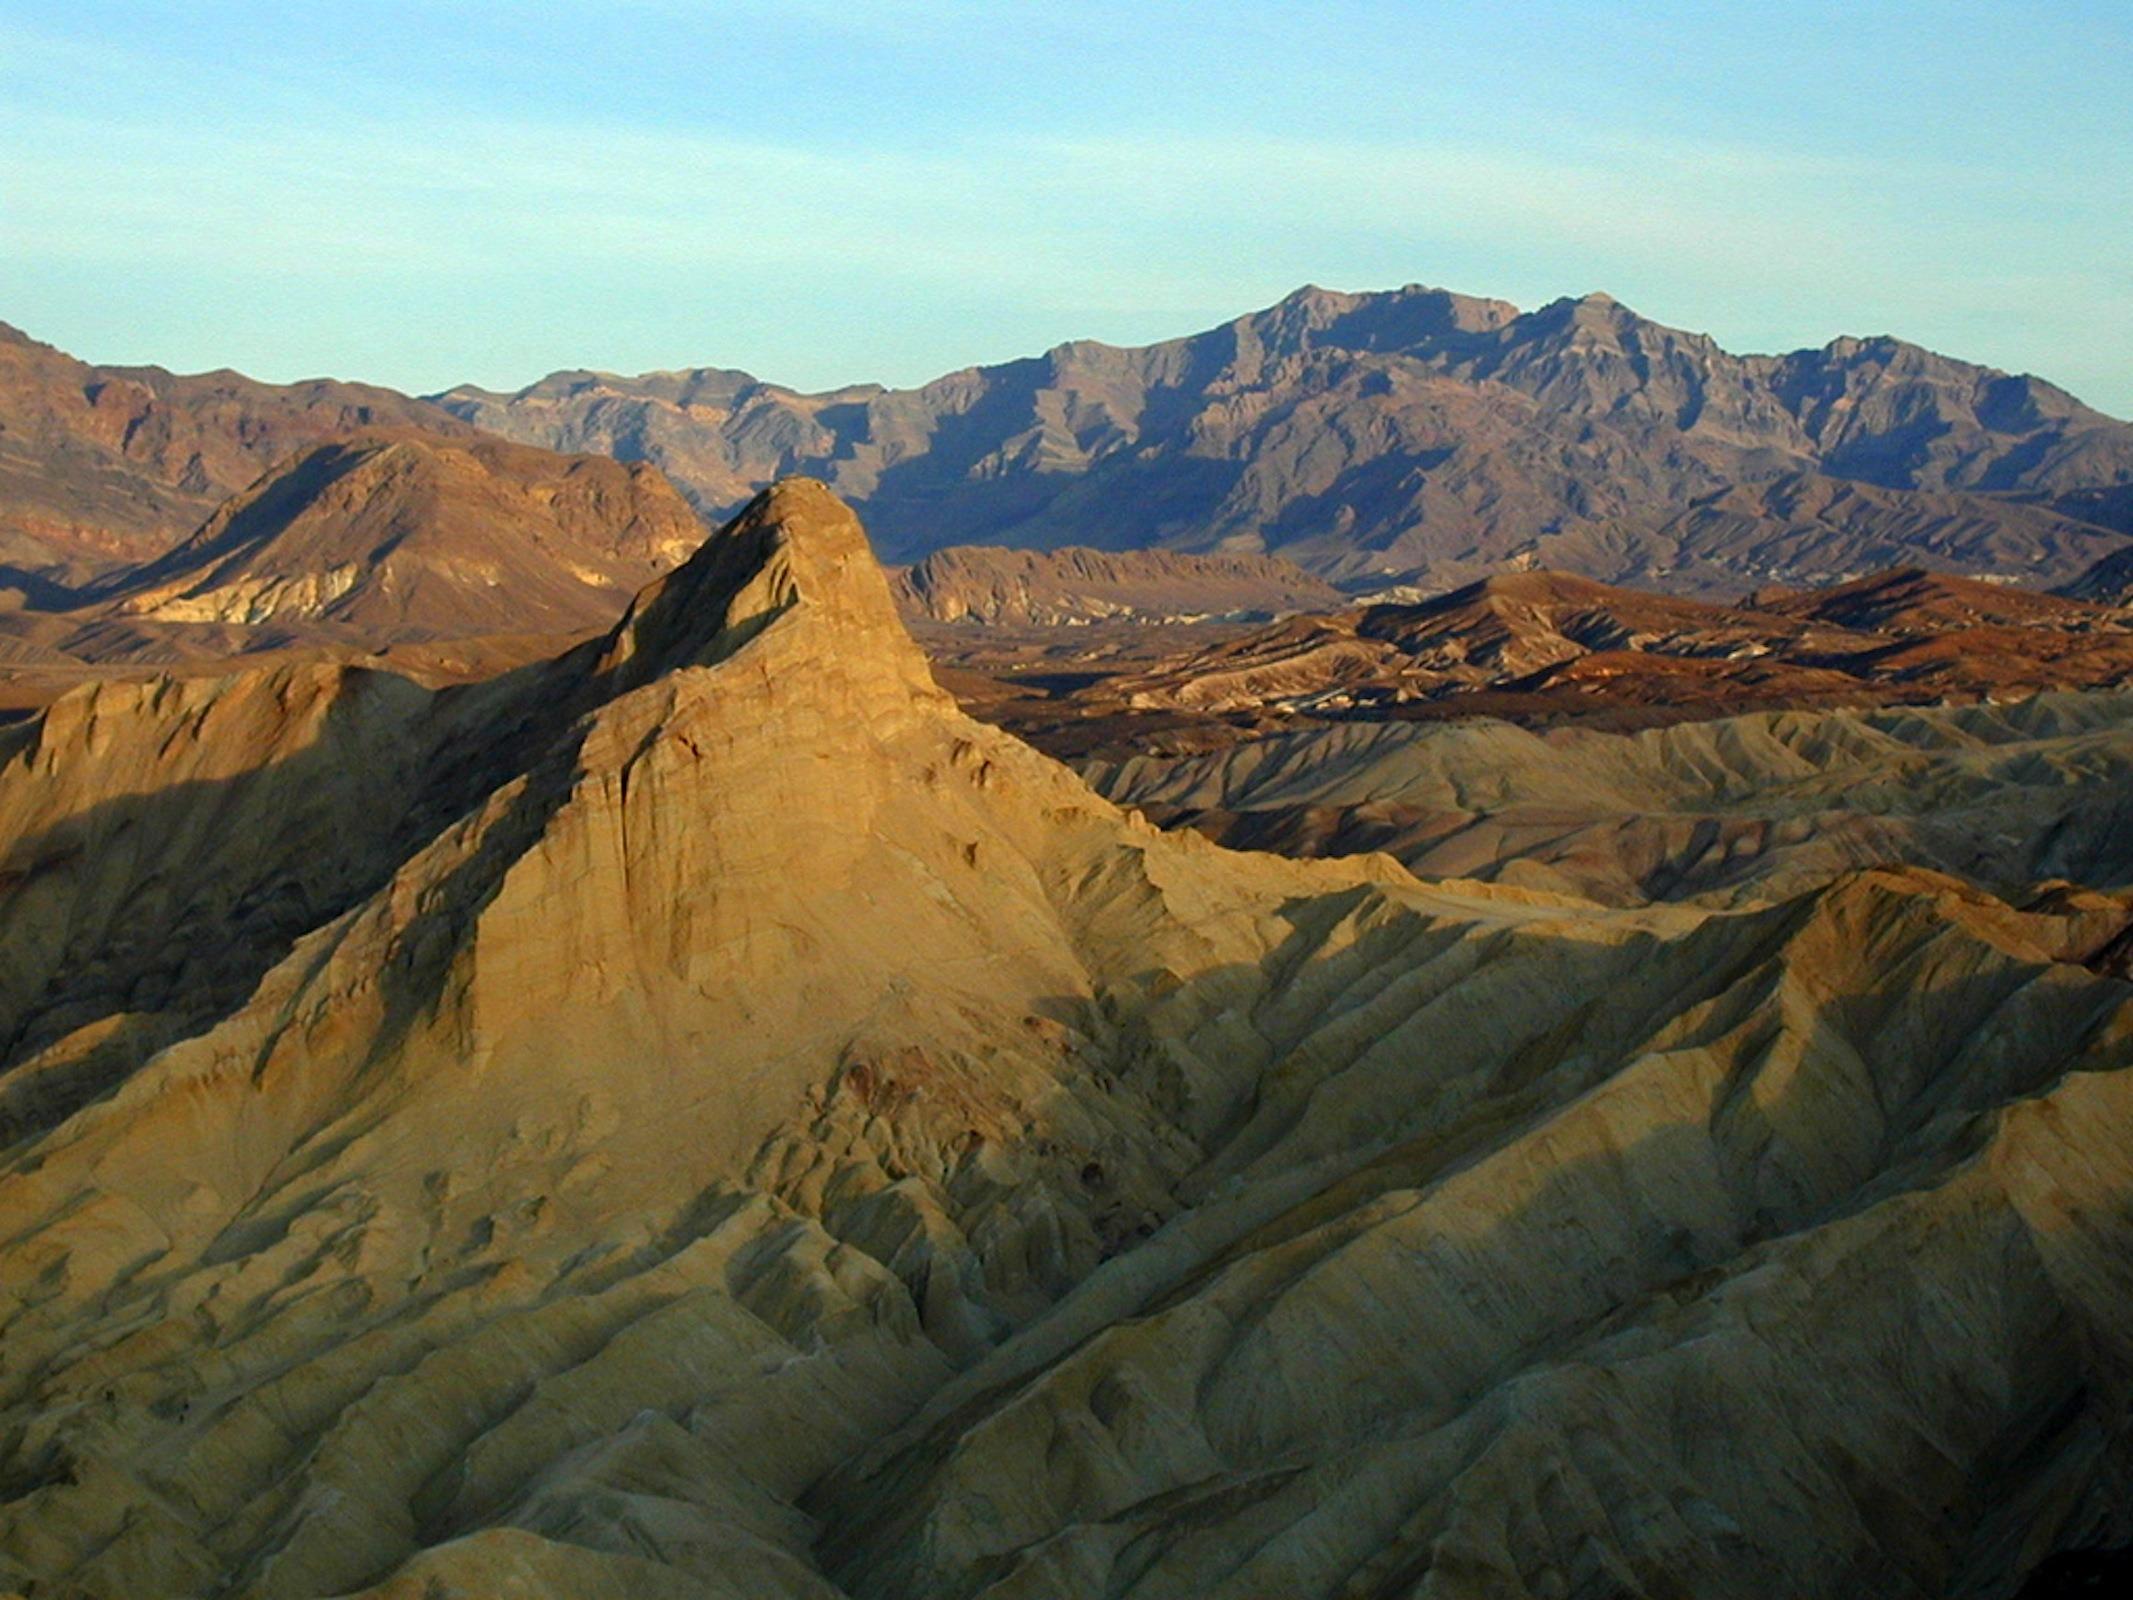 Desert valley mountains